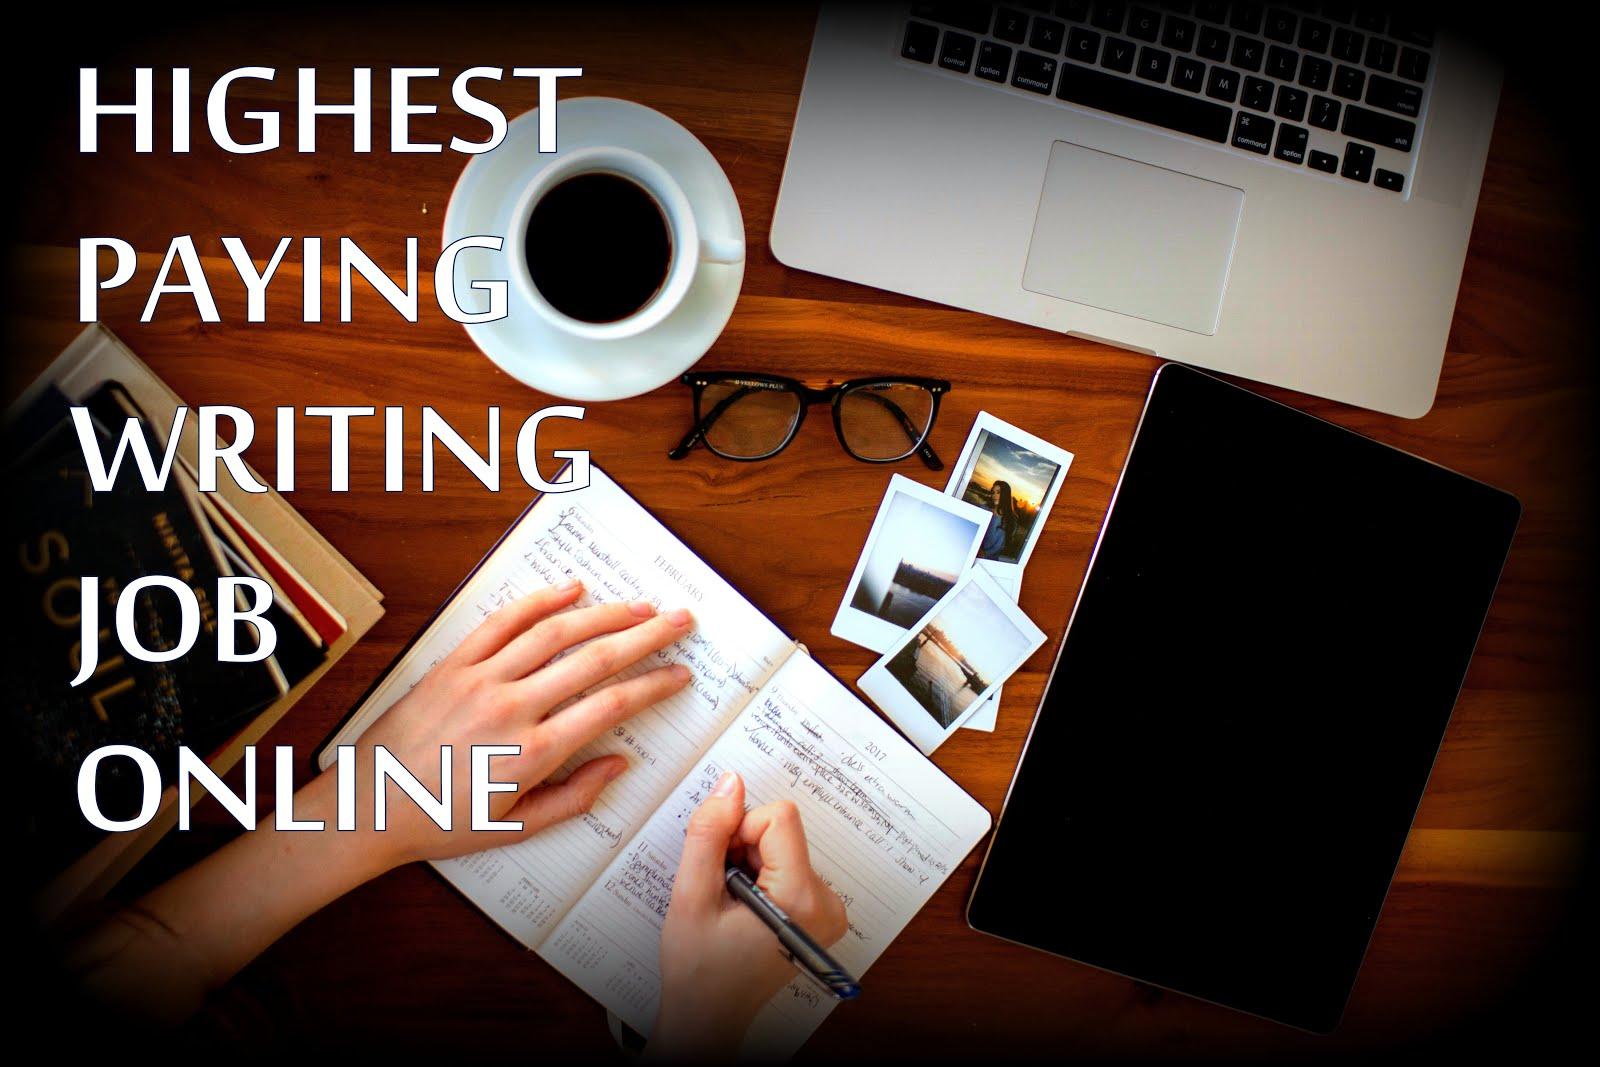 HIGHEST PAYING 2019 ONLINE WRITING JOB